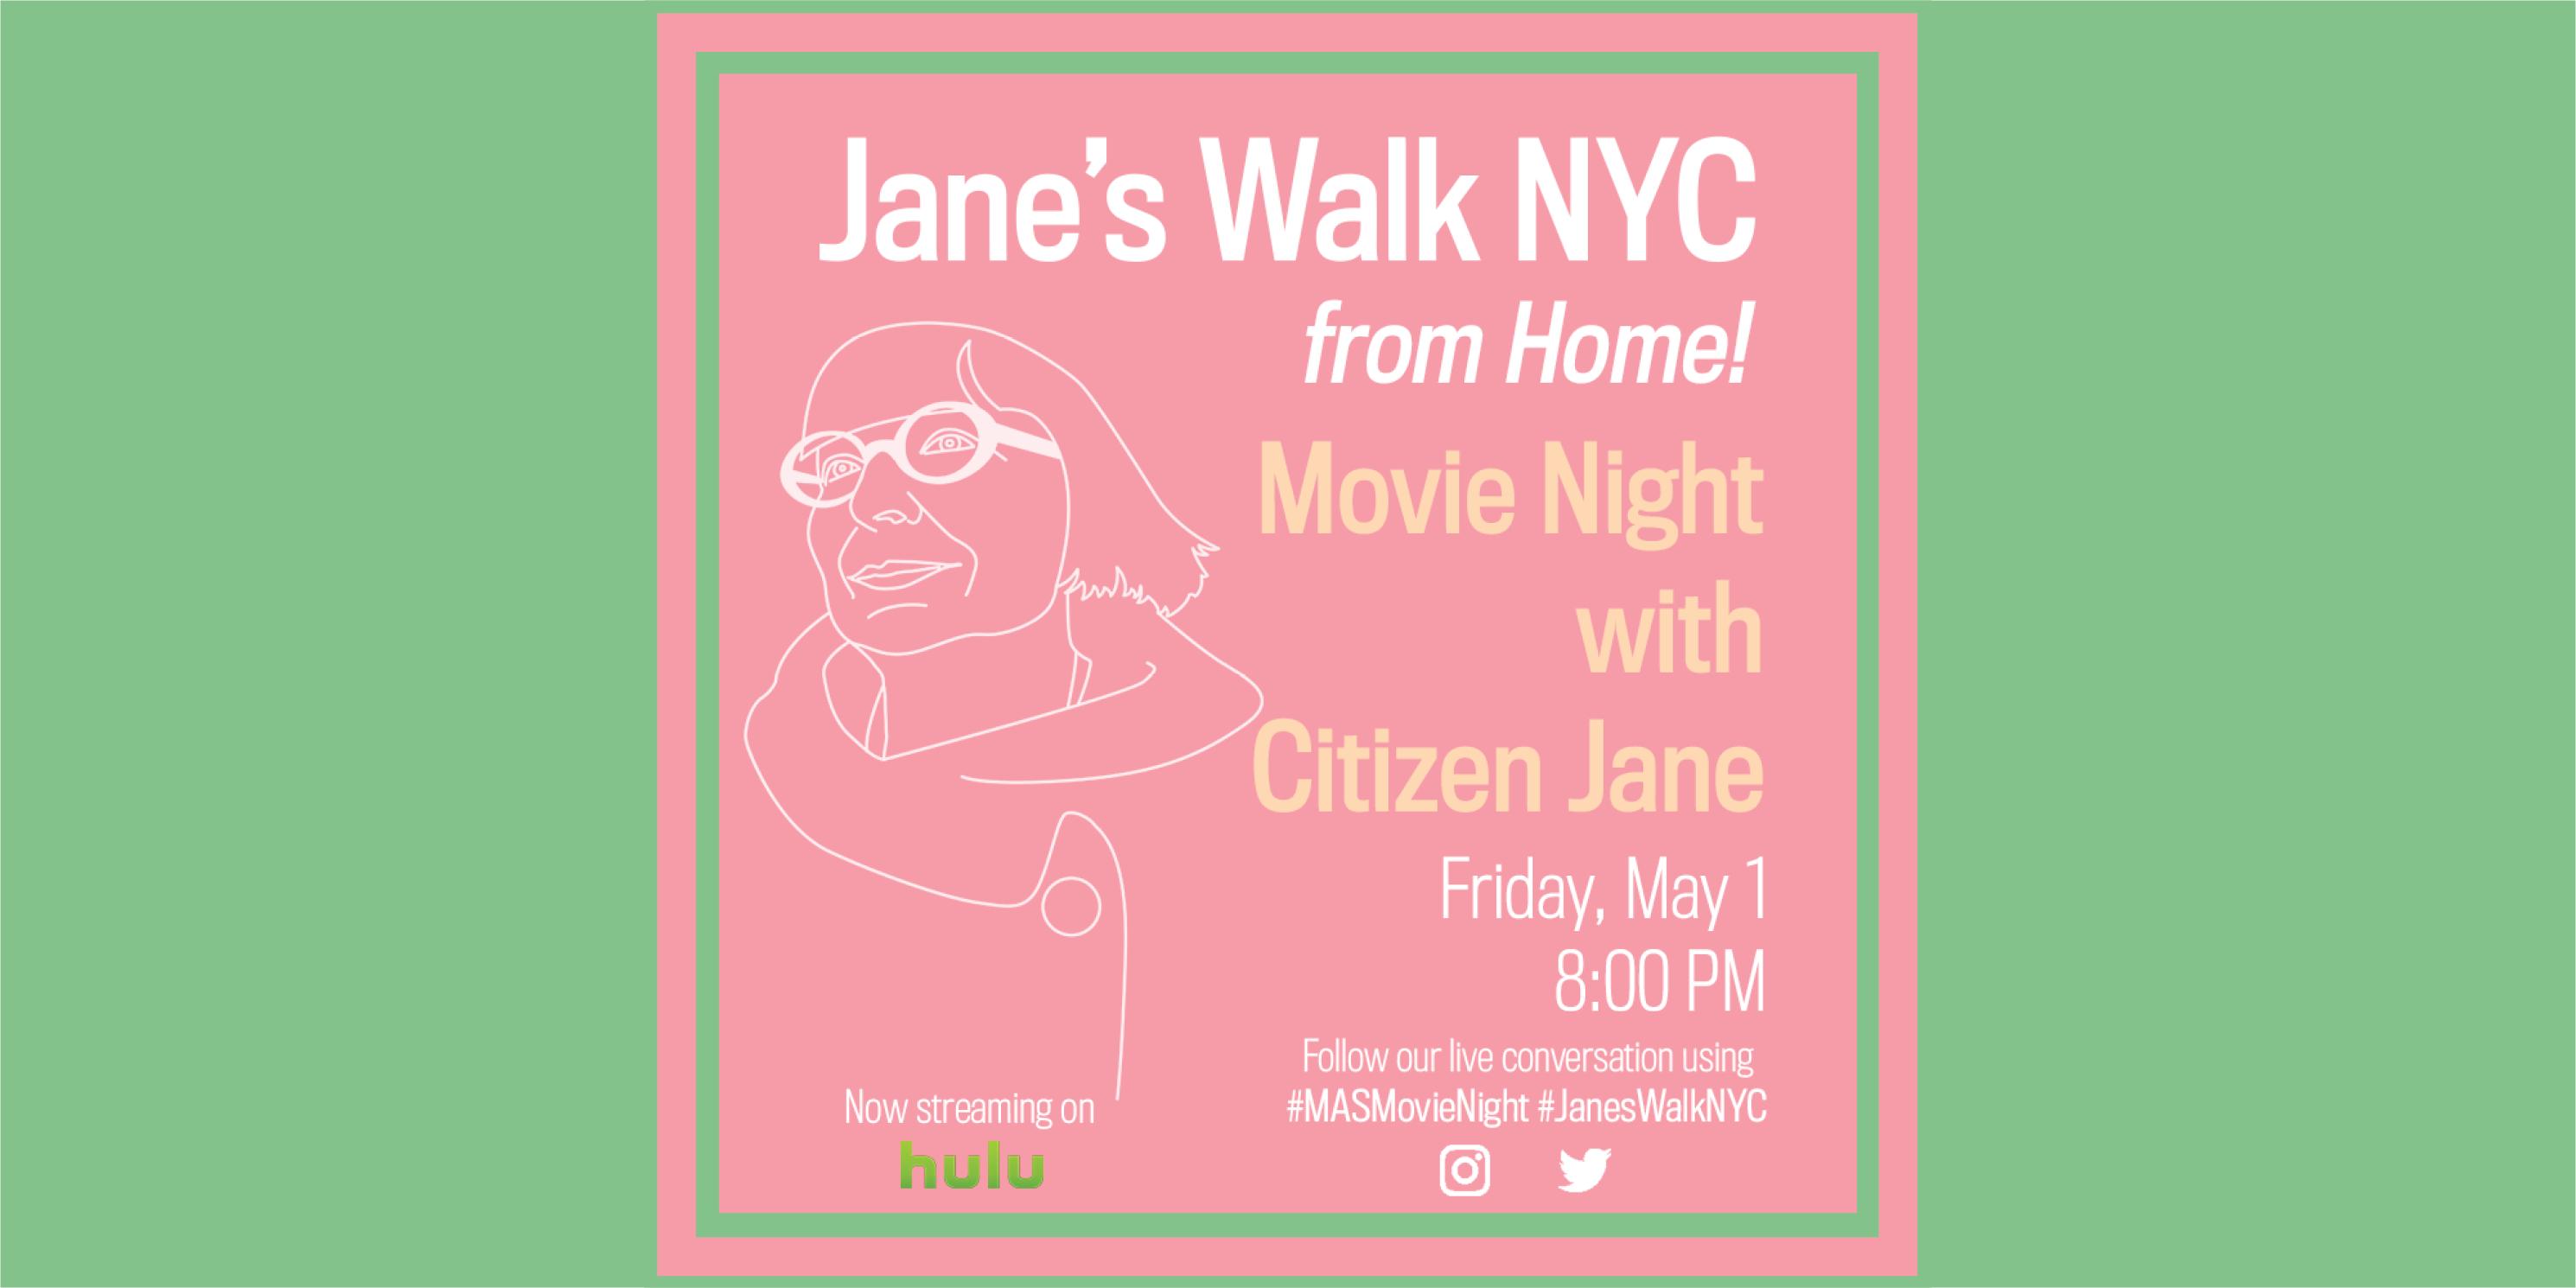 Advertisement for Jane's Walk 2020, Day 5 activities